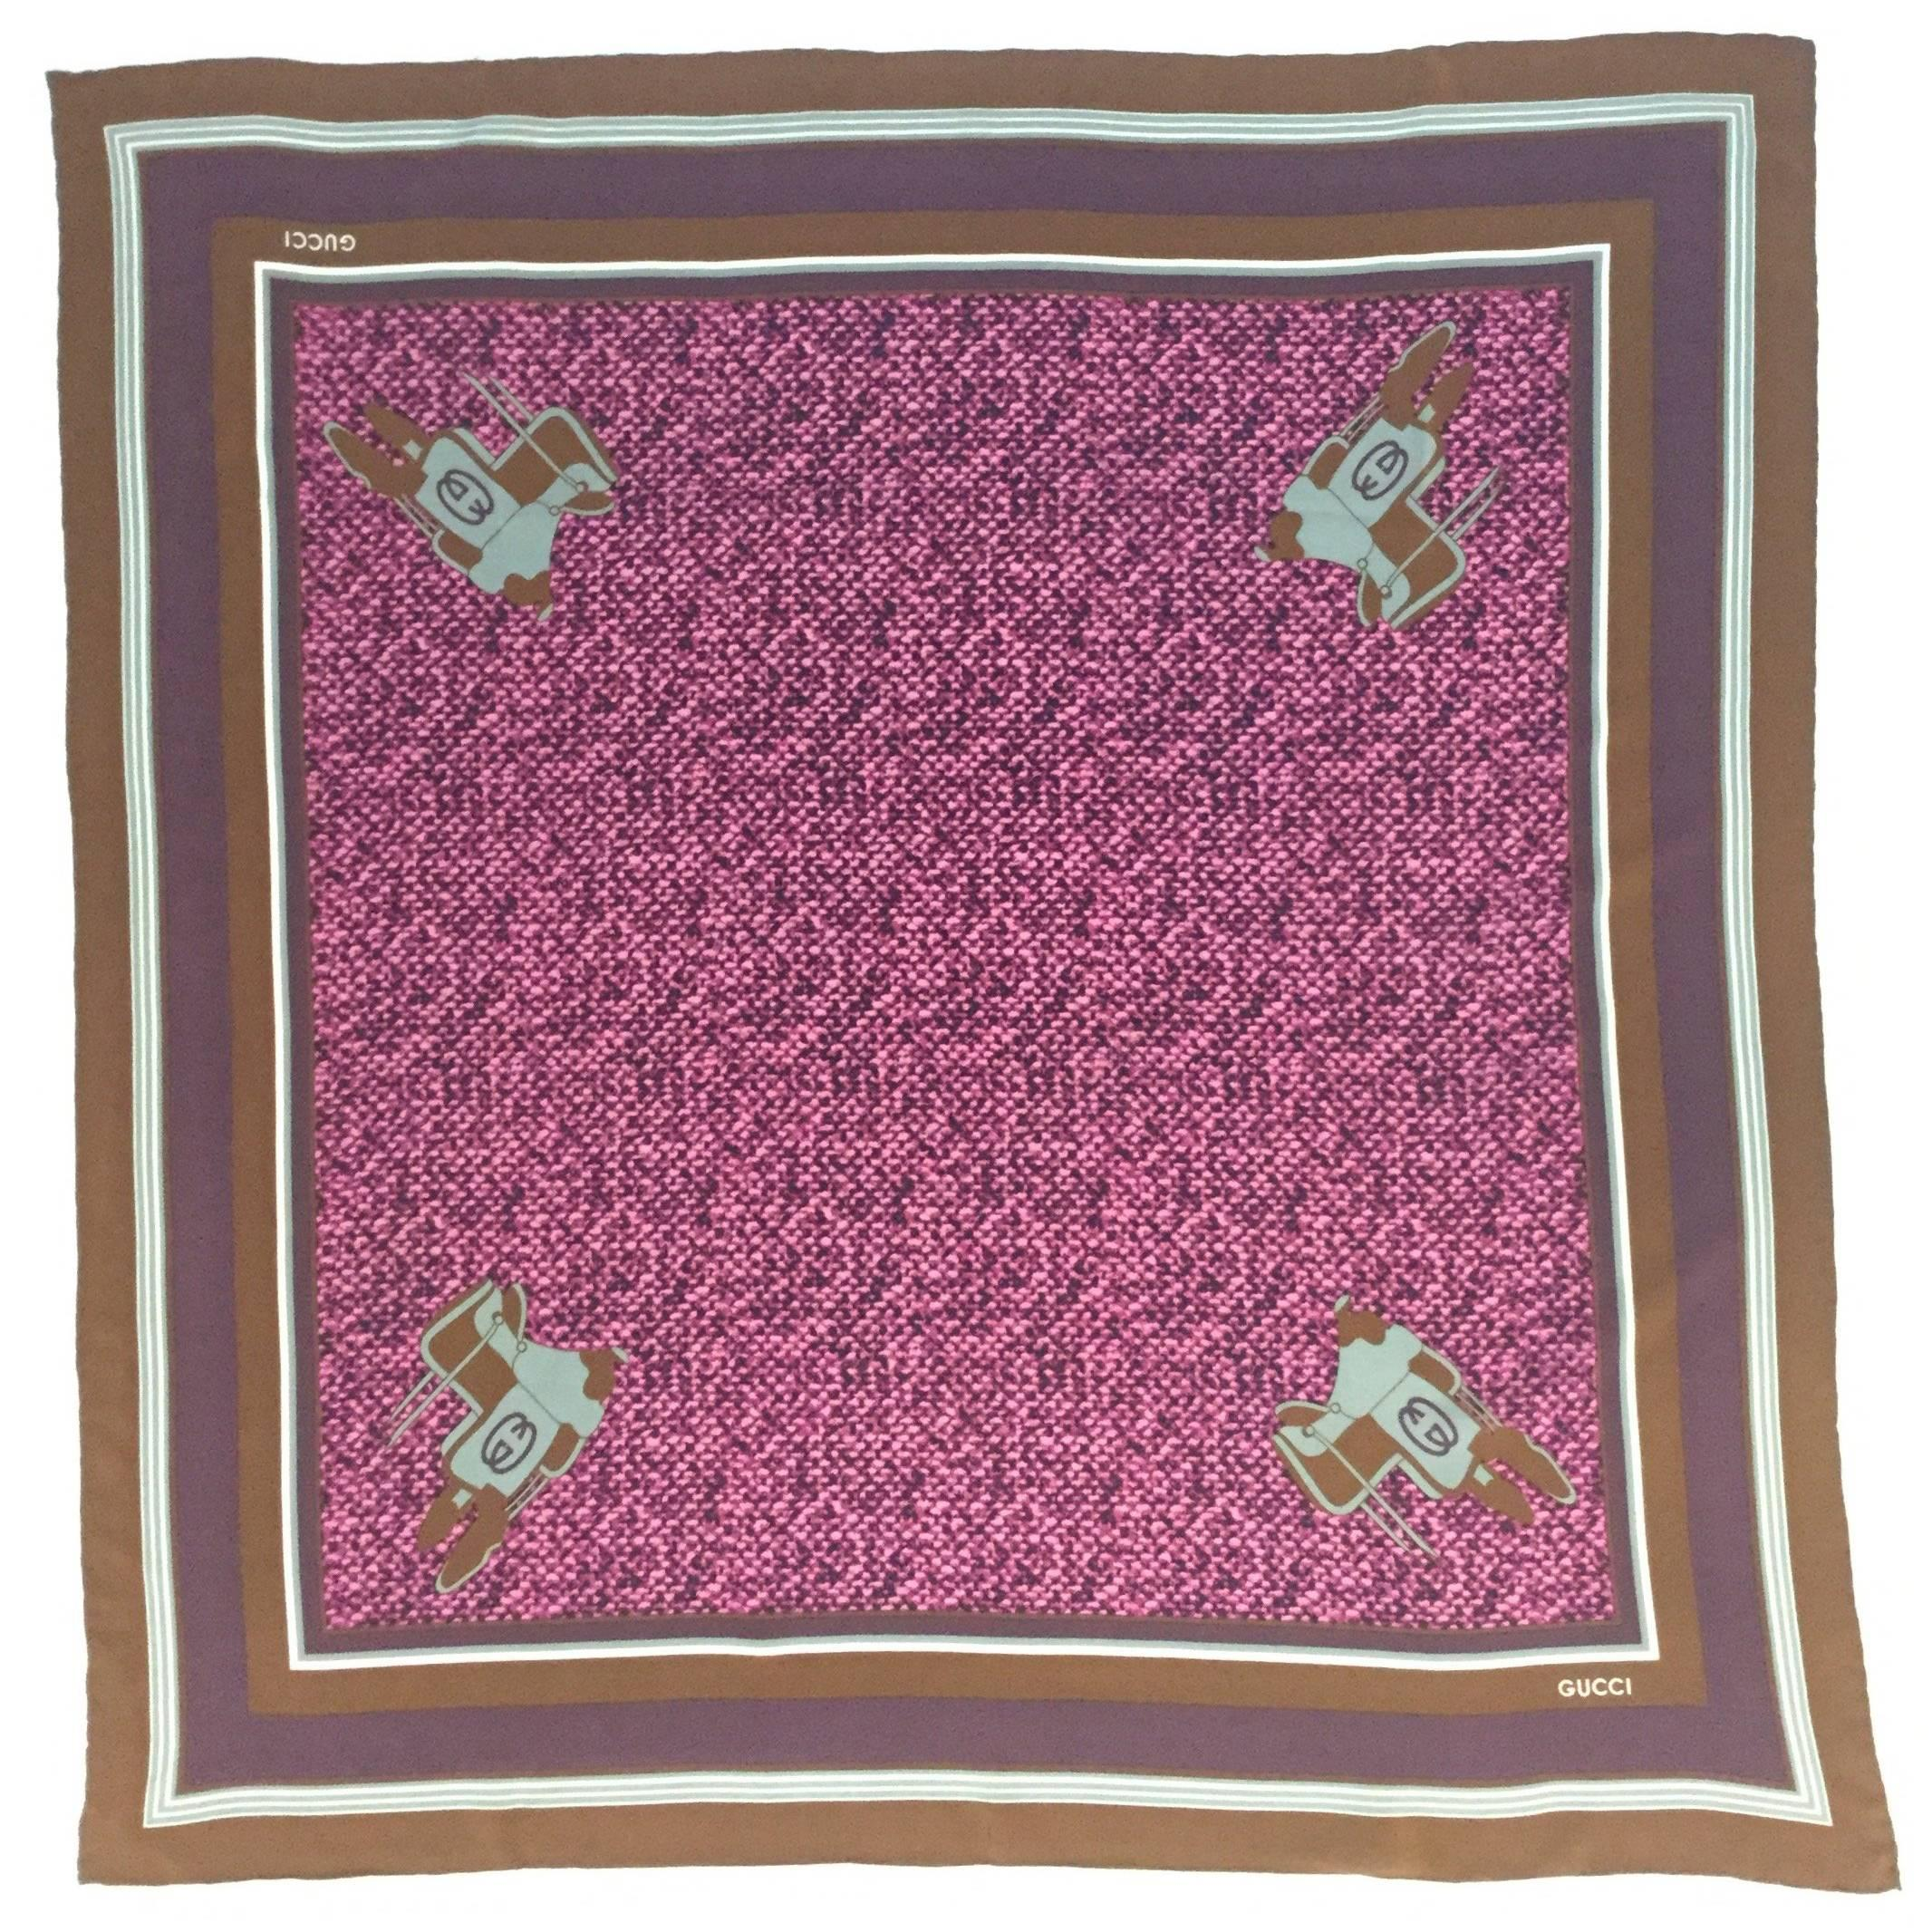 7bc01559715 Gucci Vintage Saddle and Snakeskin Print Silk Scarf at 1stdibs